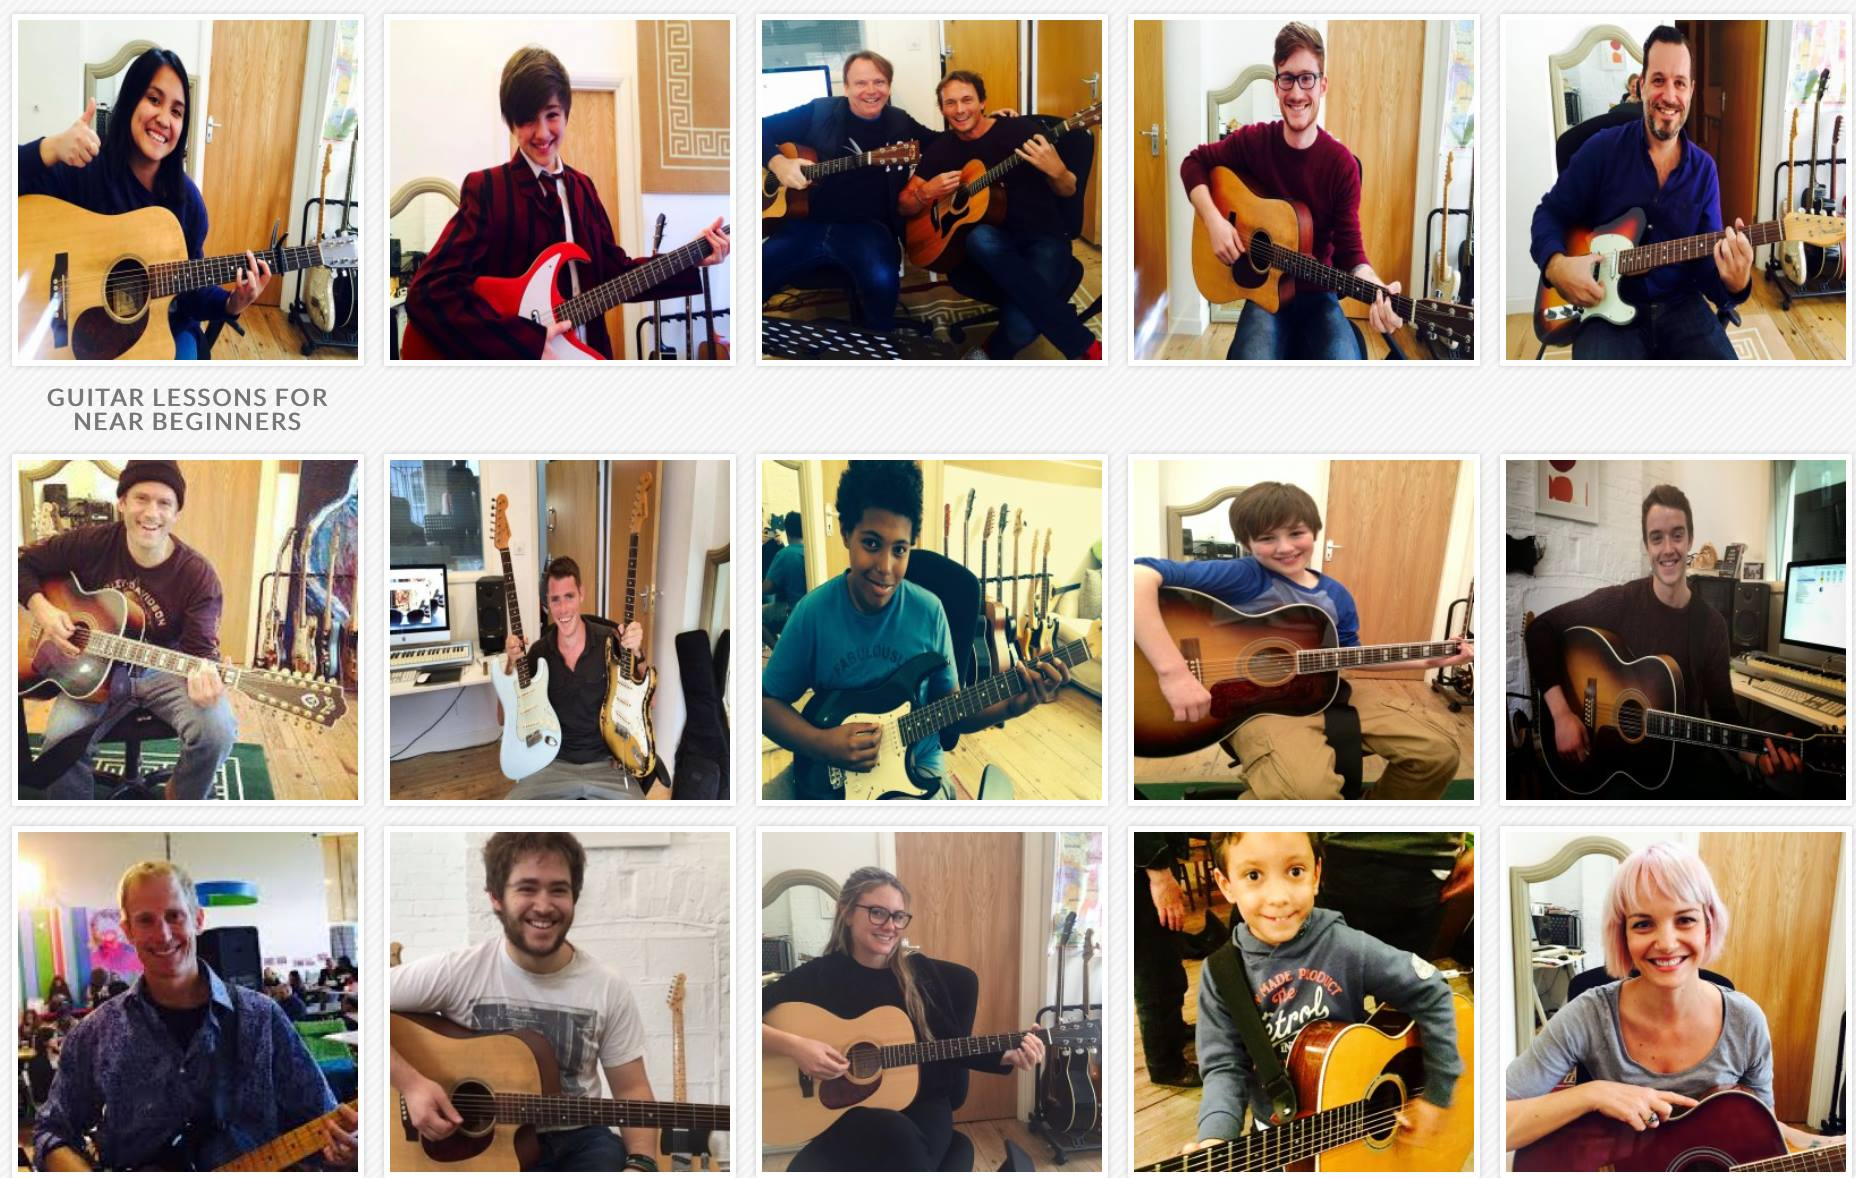 guitar lessons Brighton and Hove-Brighton, Coldean, Falmer, Hollingbury, Patcham, Preston, Stanmer, Withdean